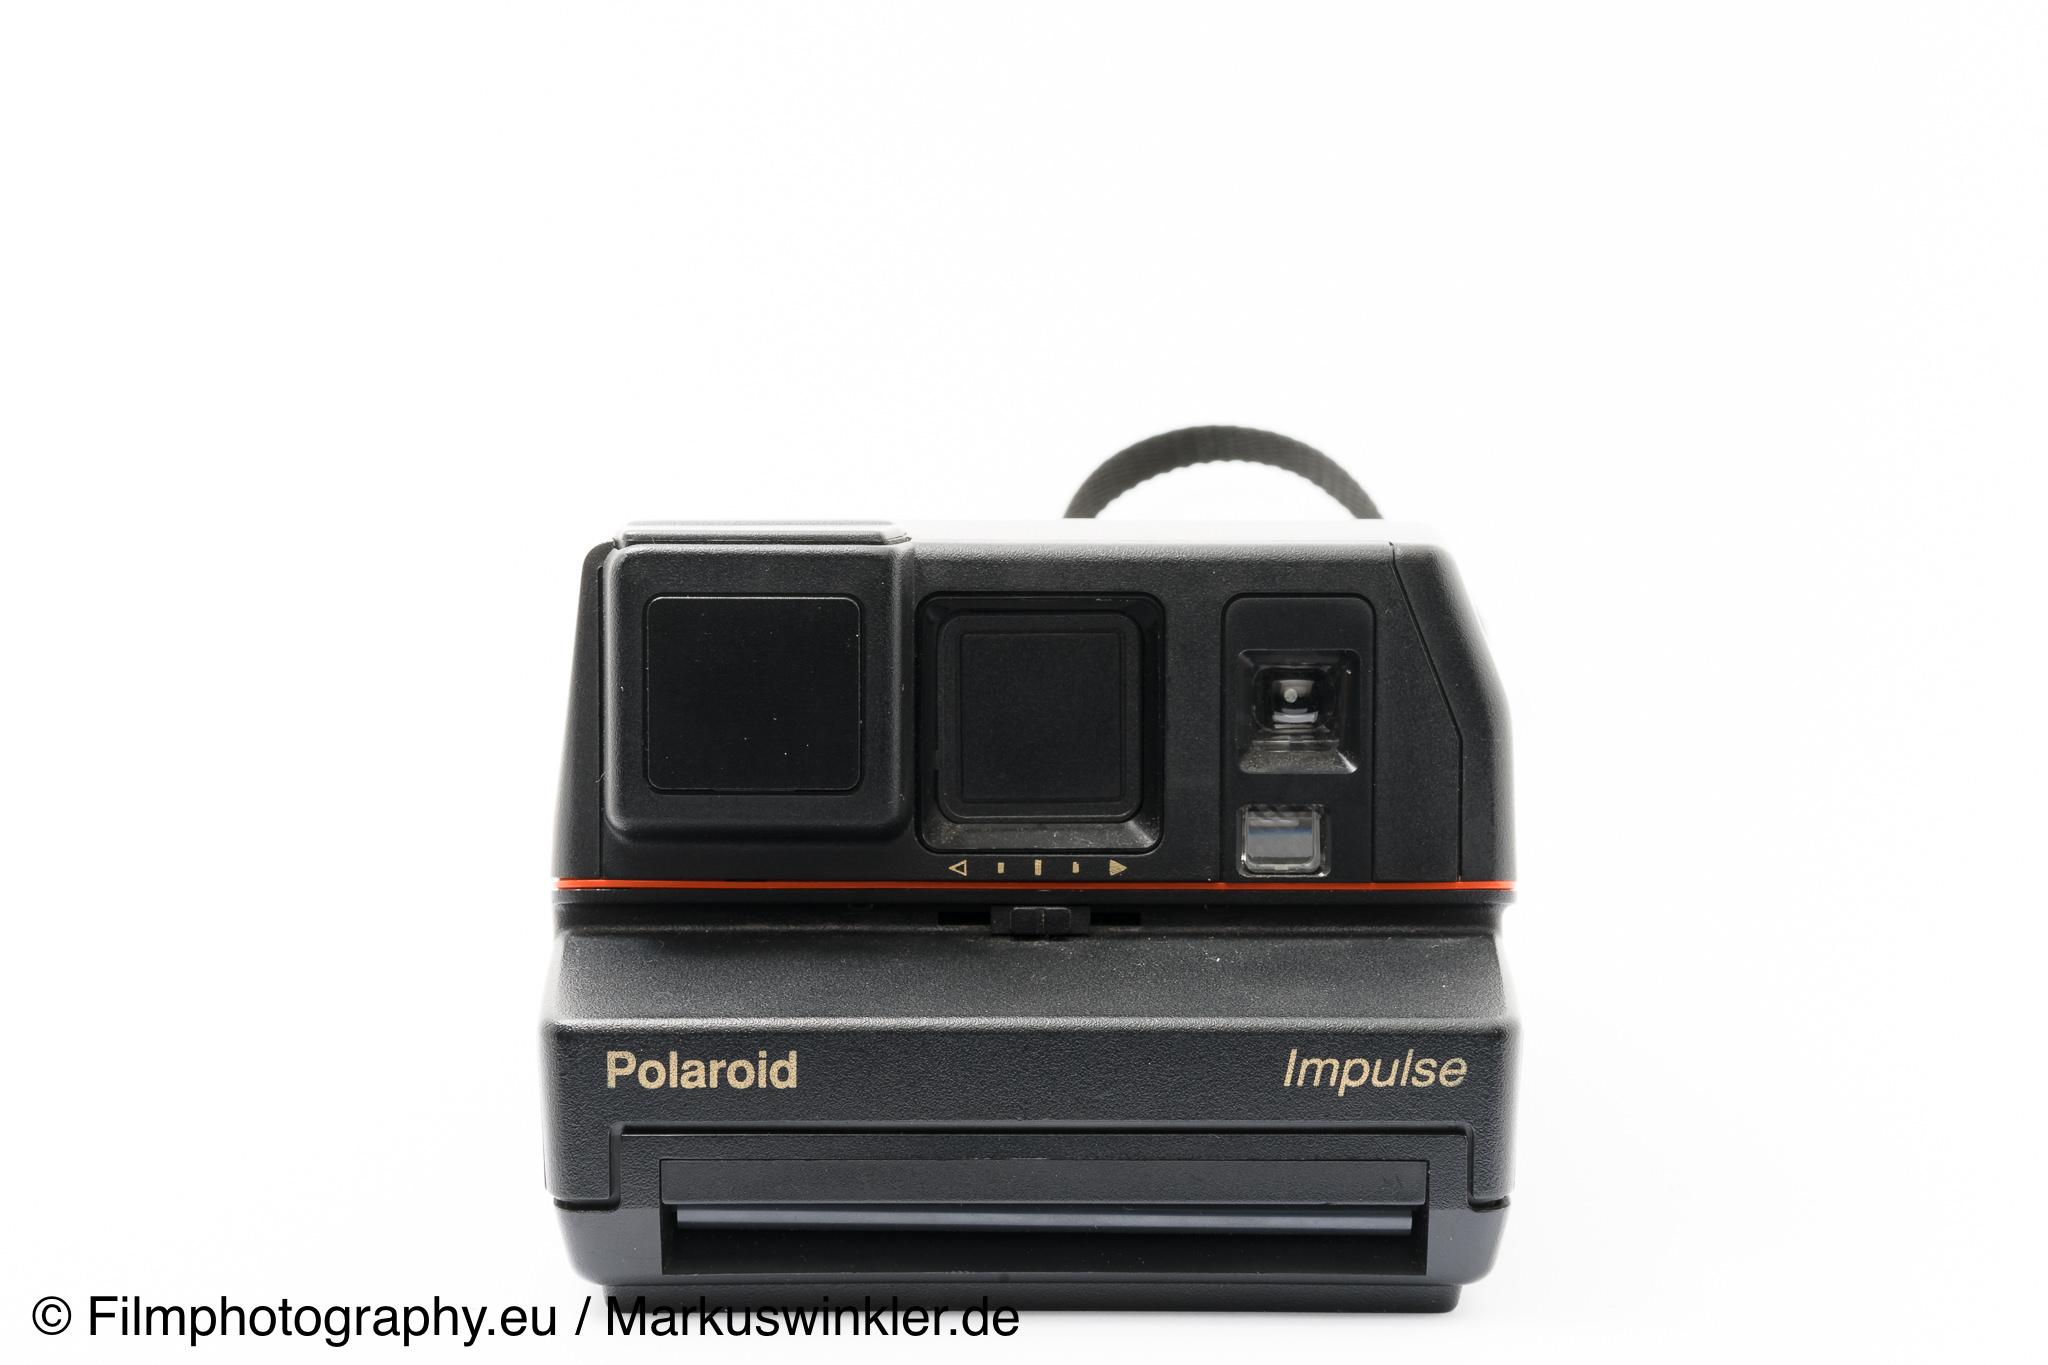 polaroid impulse sofortbildkamera. Black Bedroom Furniture Sets. Home Design Ideas